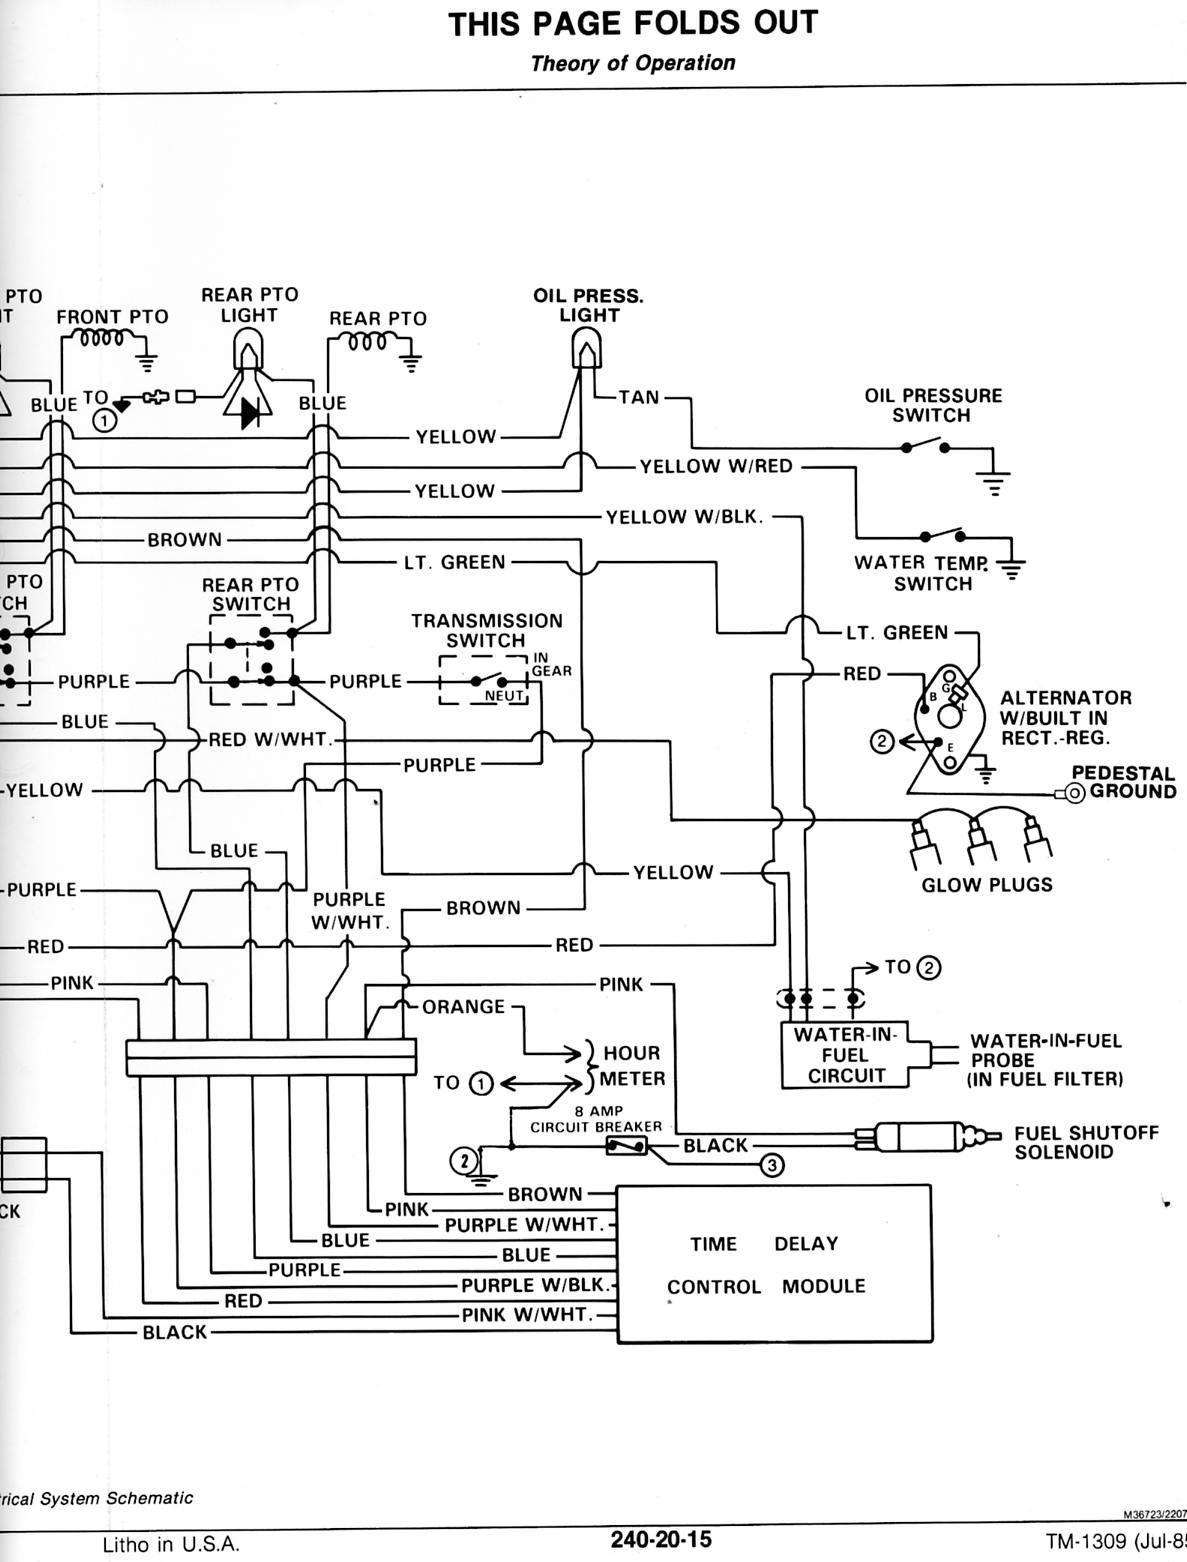 EC_7585] 1070 Case Wiring Diagram Wiring DiagramGentot Greas Benkeme Mohammedshrine Librar Wiring 101